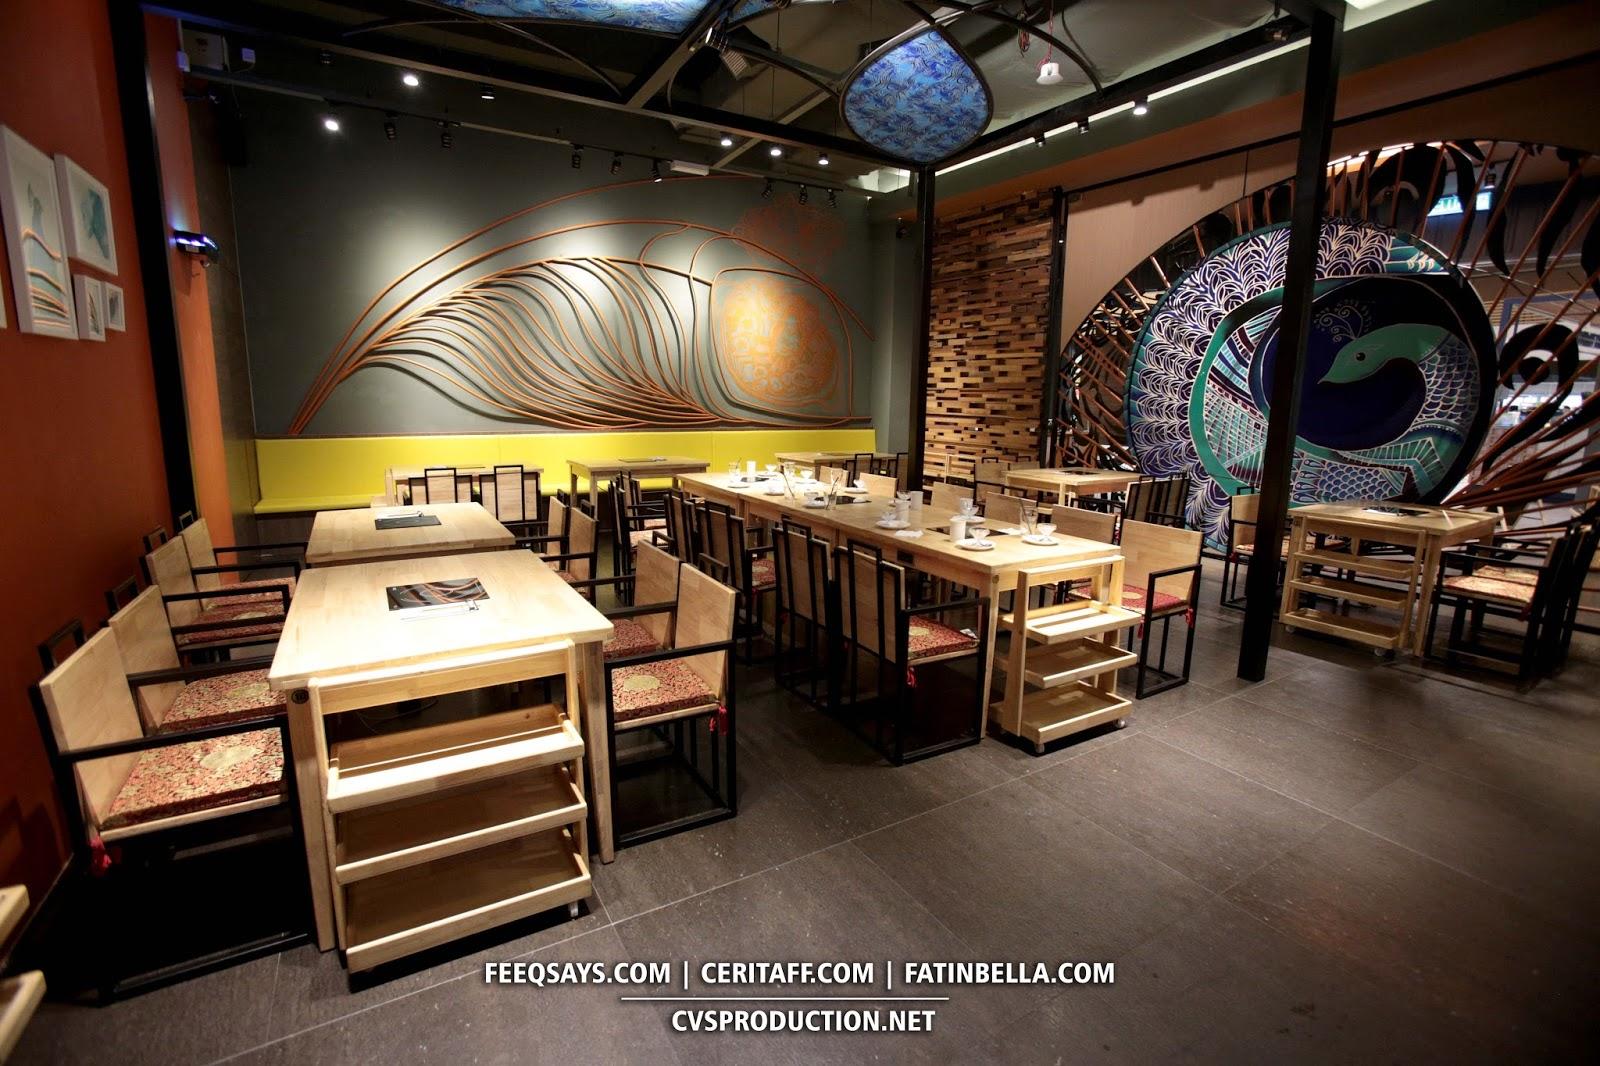 57 hotpot & asian cuisine restaurant at ioi city mall putrajaya ...